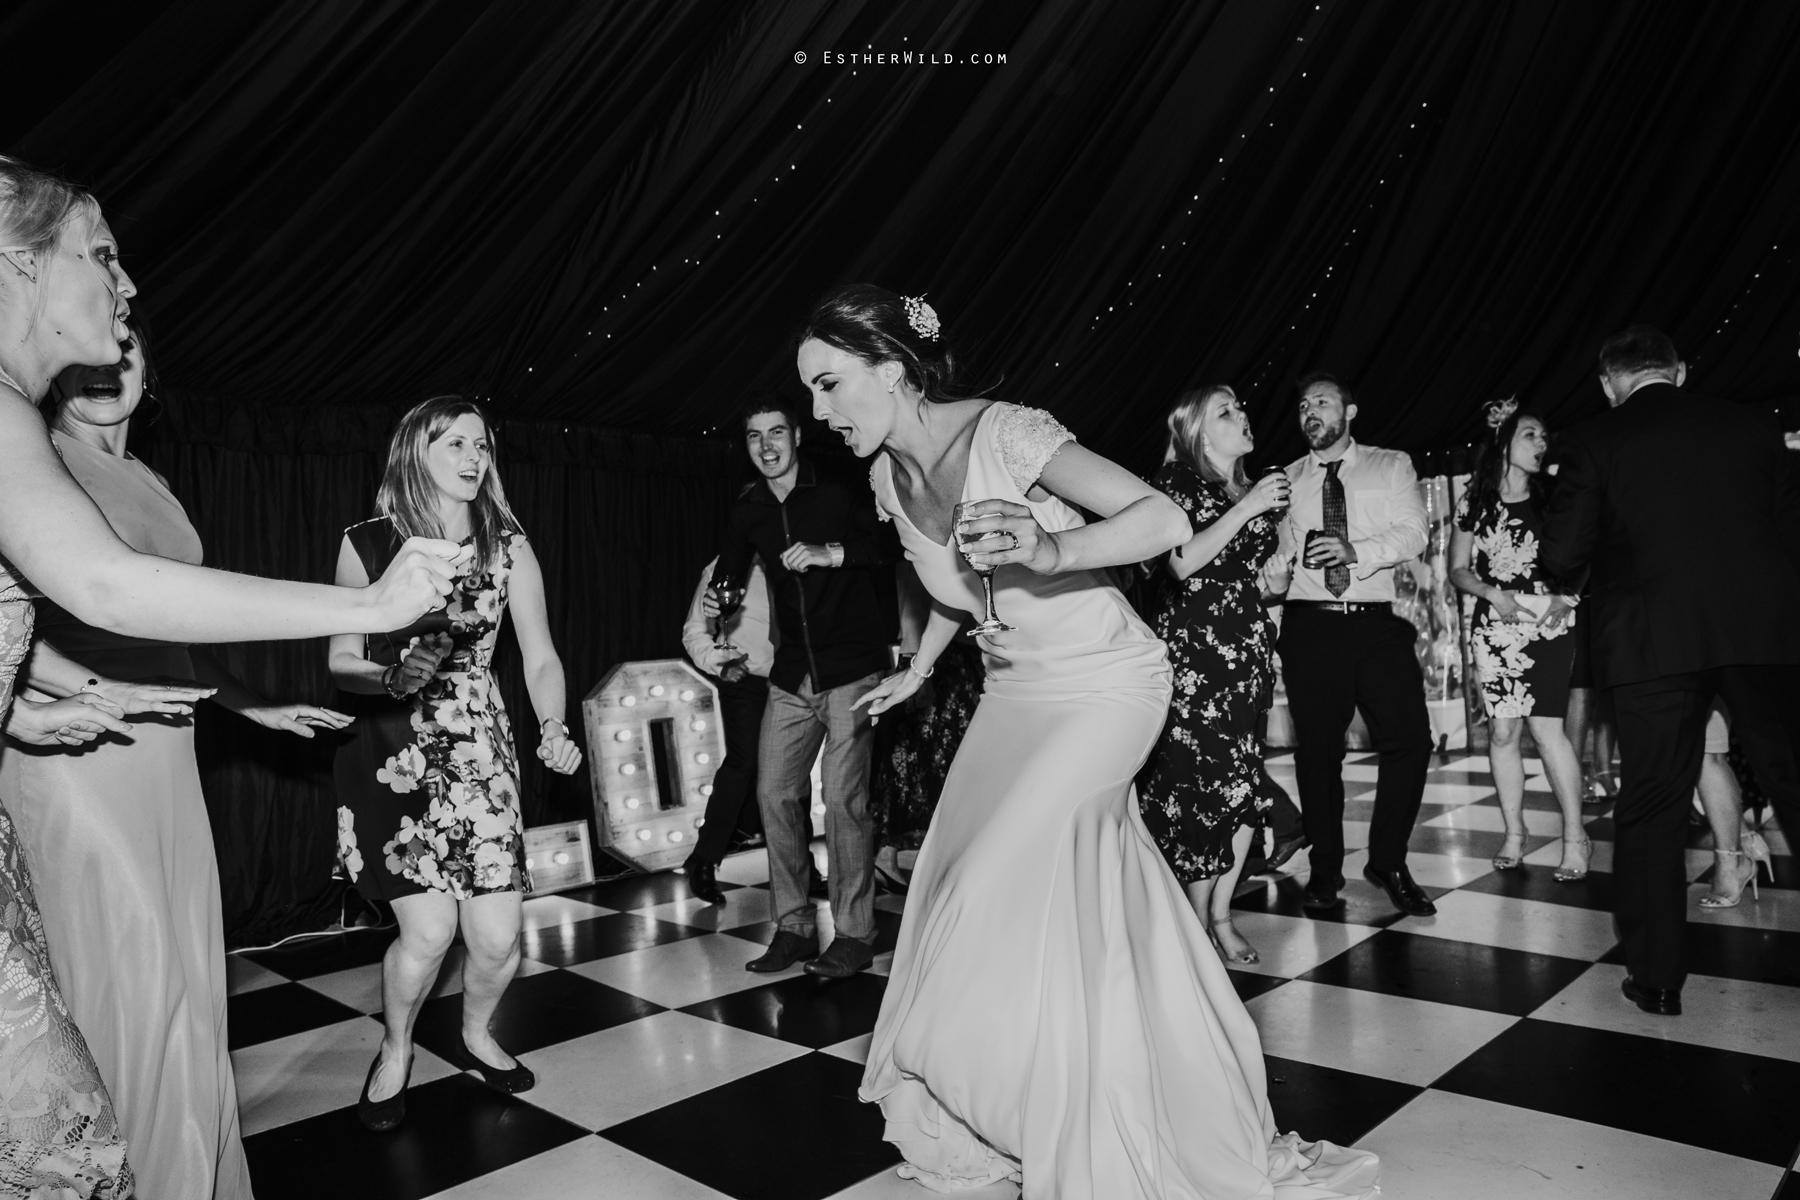 Wootton_Wedding_Copyright_Esther_Wild_Photographer_IMG_3409-2.jpg